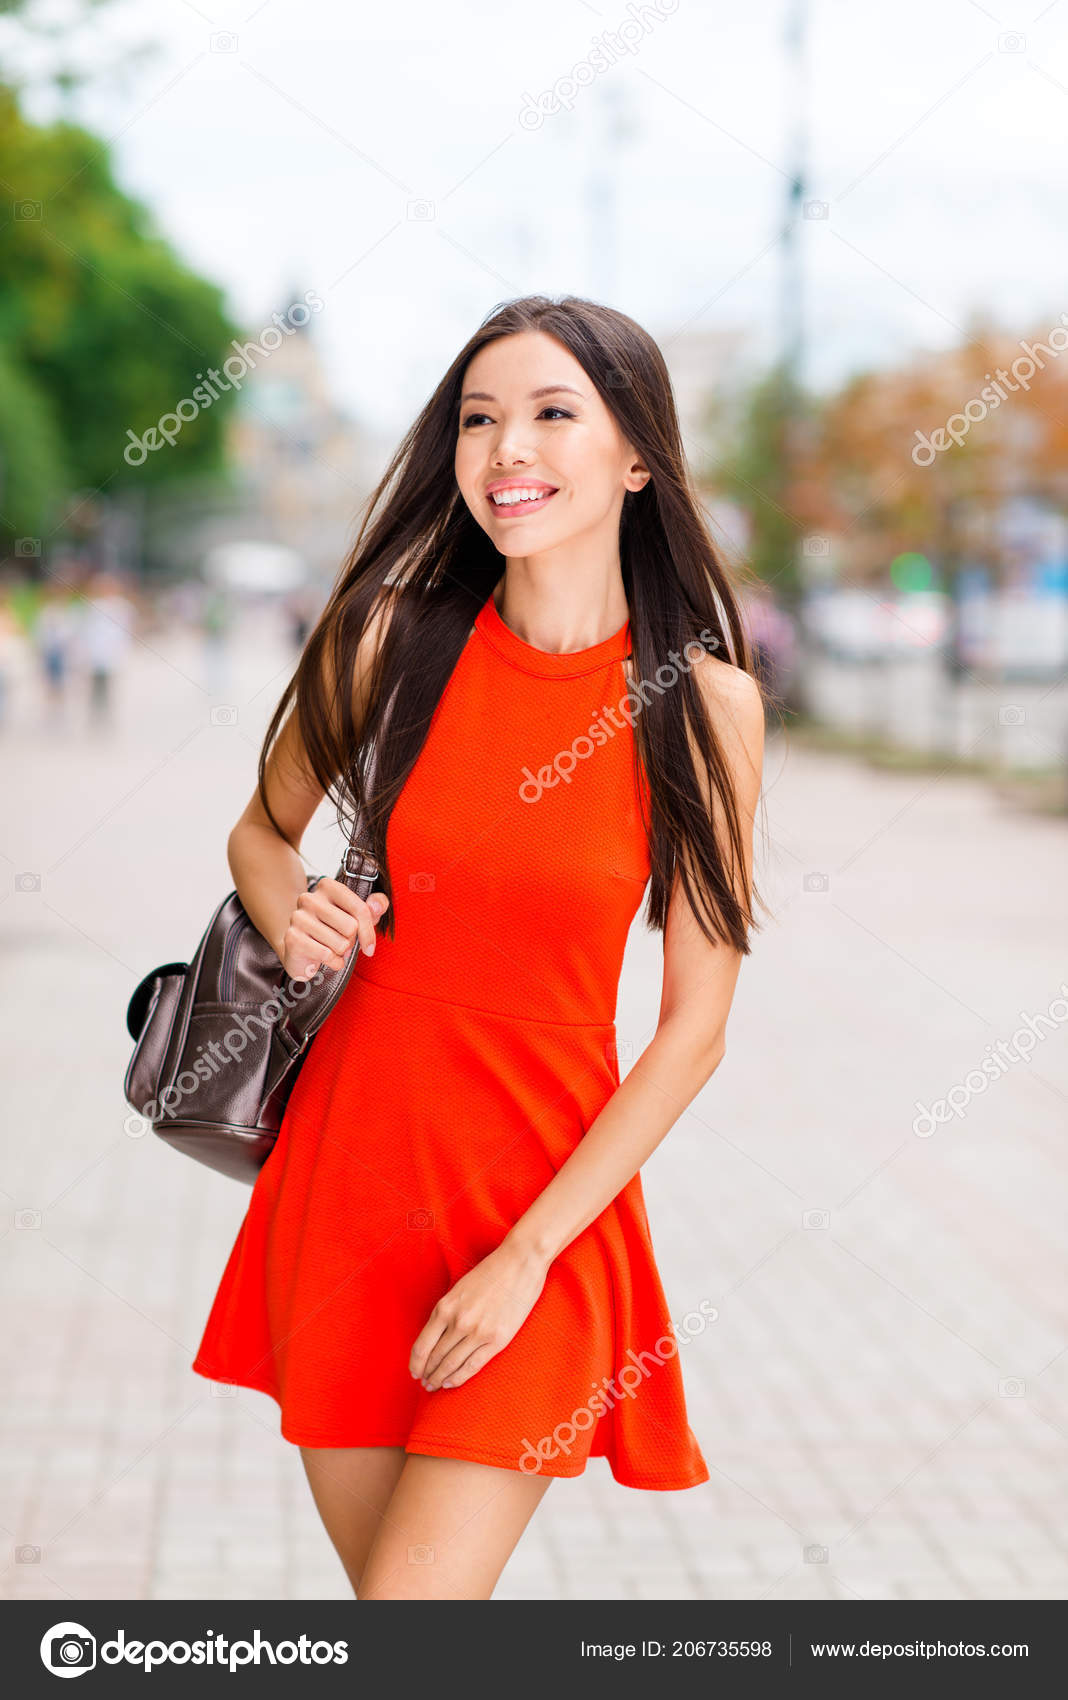 f703ef942 Retrato Vertical Mujer Asiática Joven Fascinante Mini Vestido Rojo ...